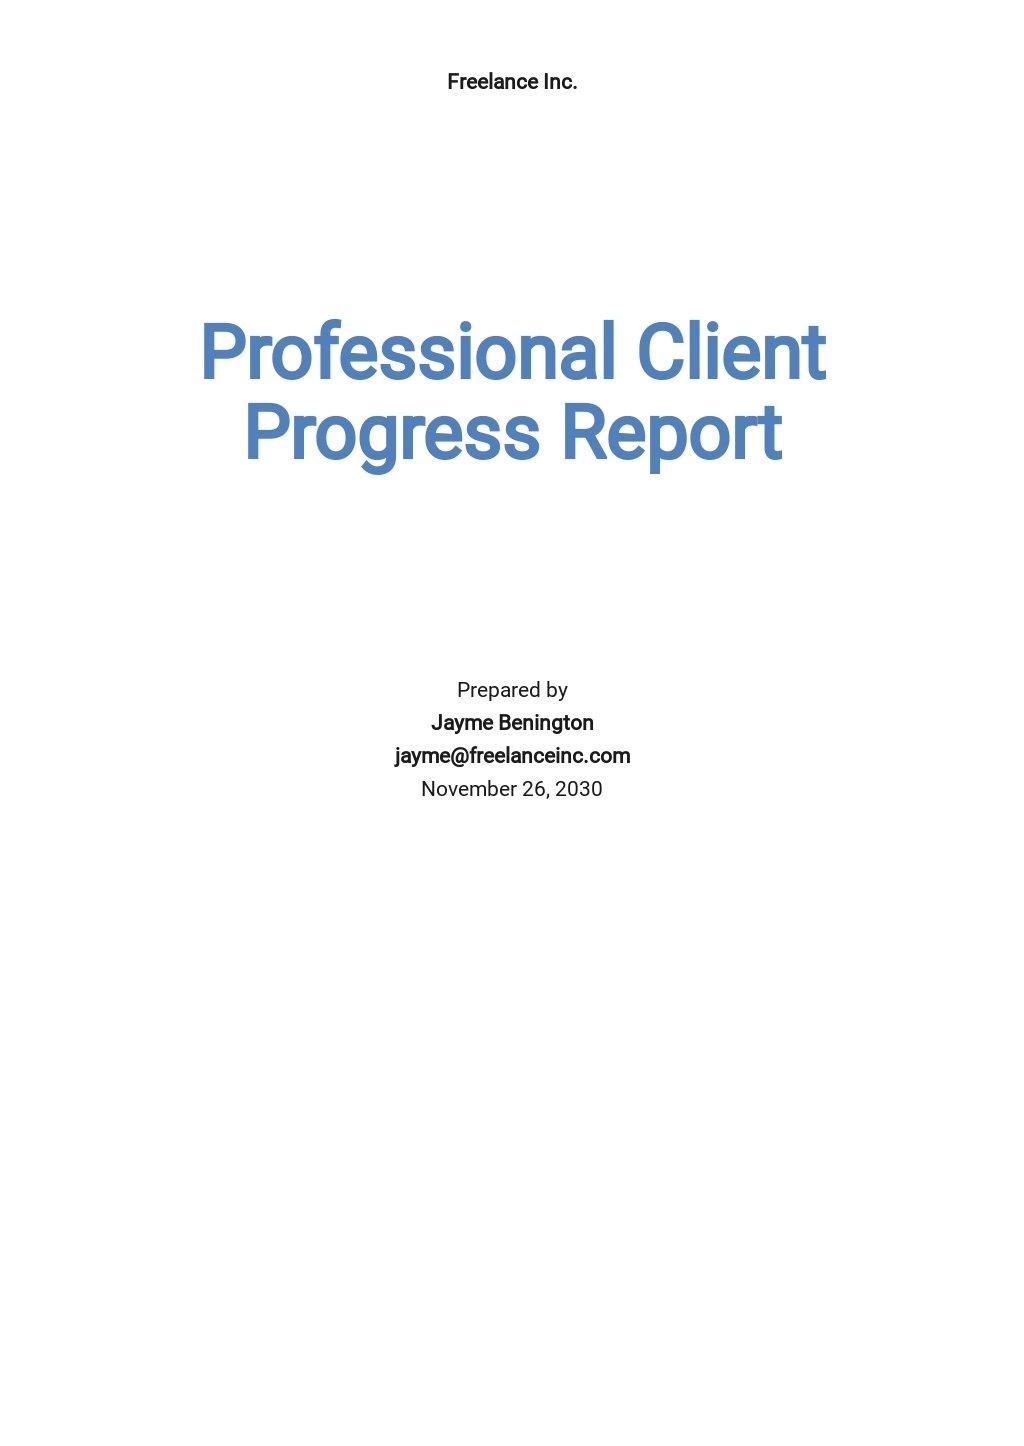 Professional Client Progress Report Template.jpe